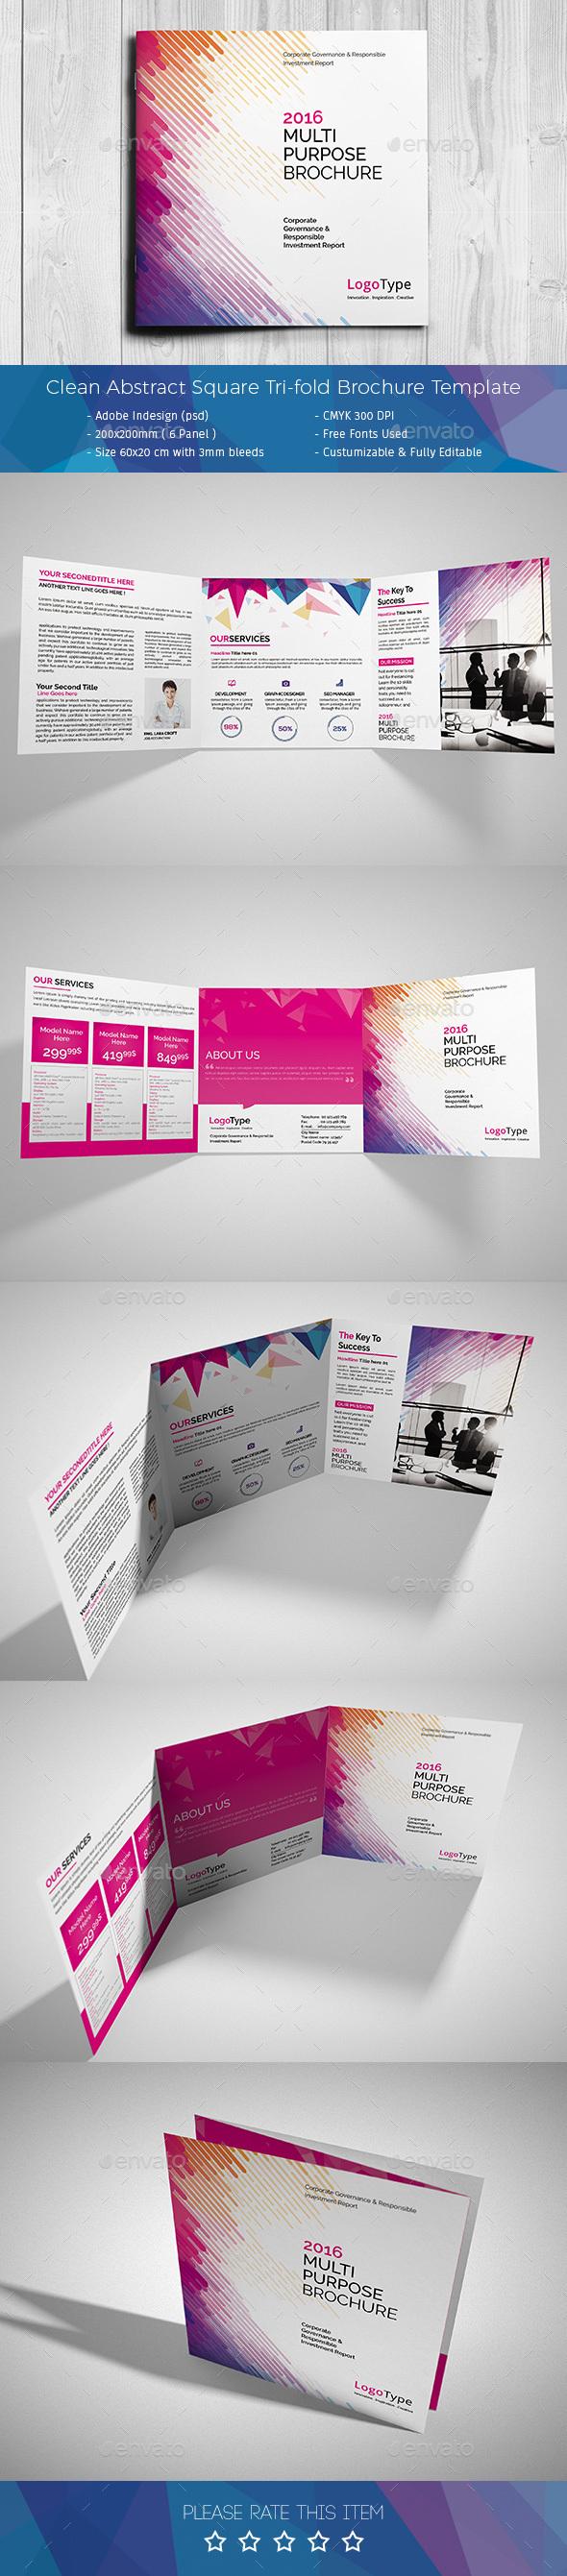 Corporate Tri-fold Square Brochure 05 - Corporate Brochures